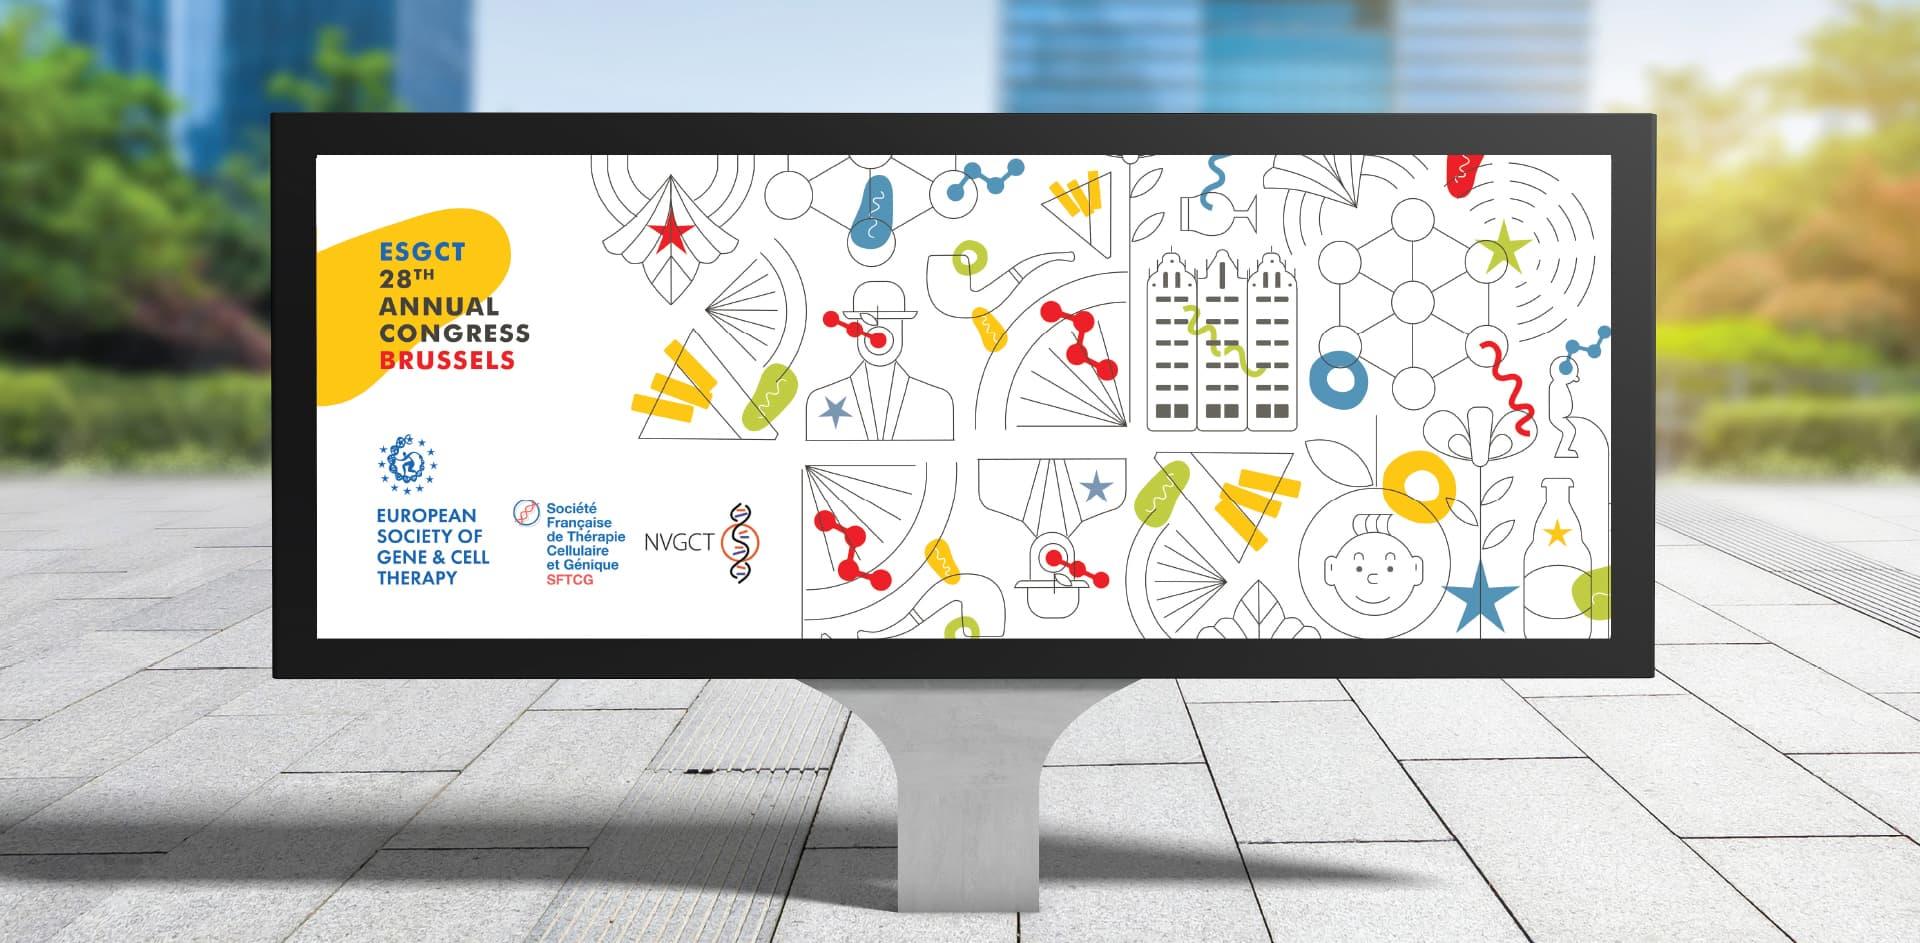 ESGCT Congress Brussels 2021 wide screen display